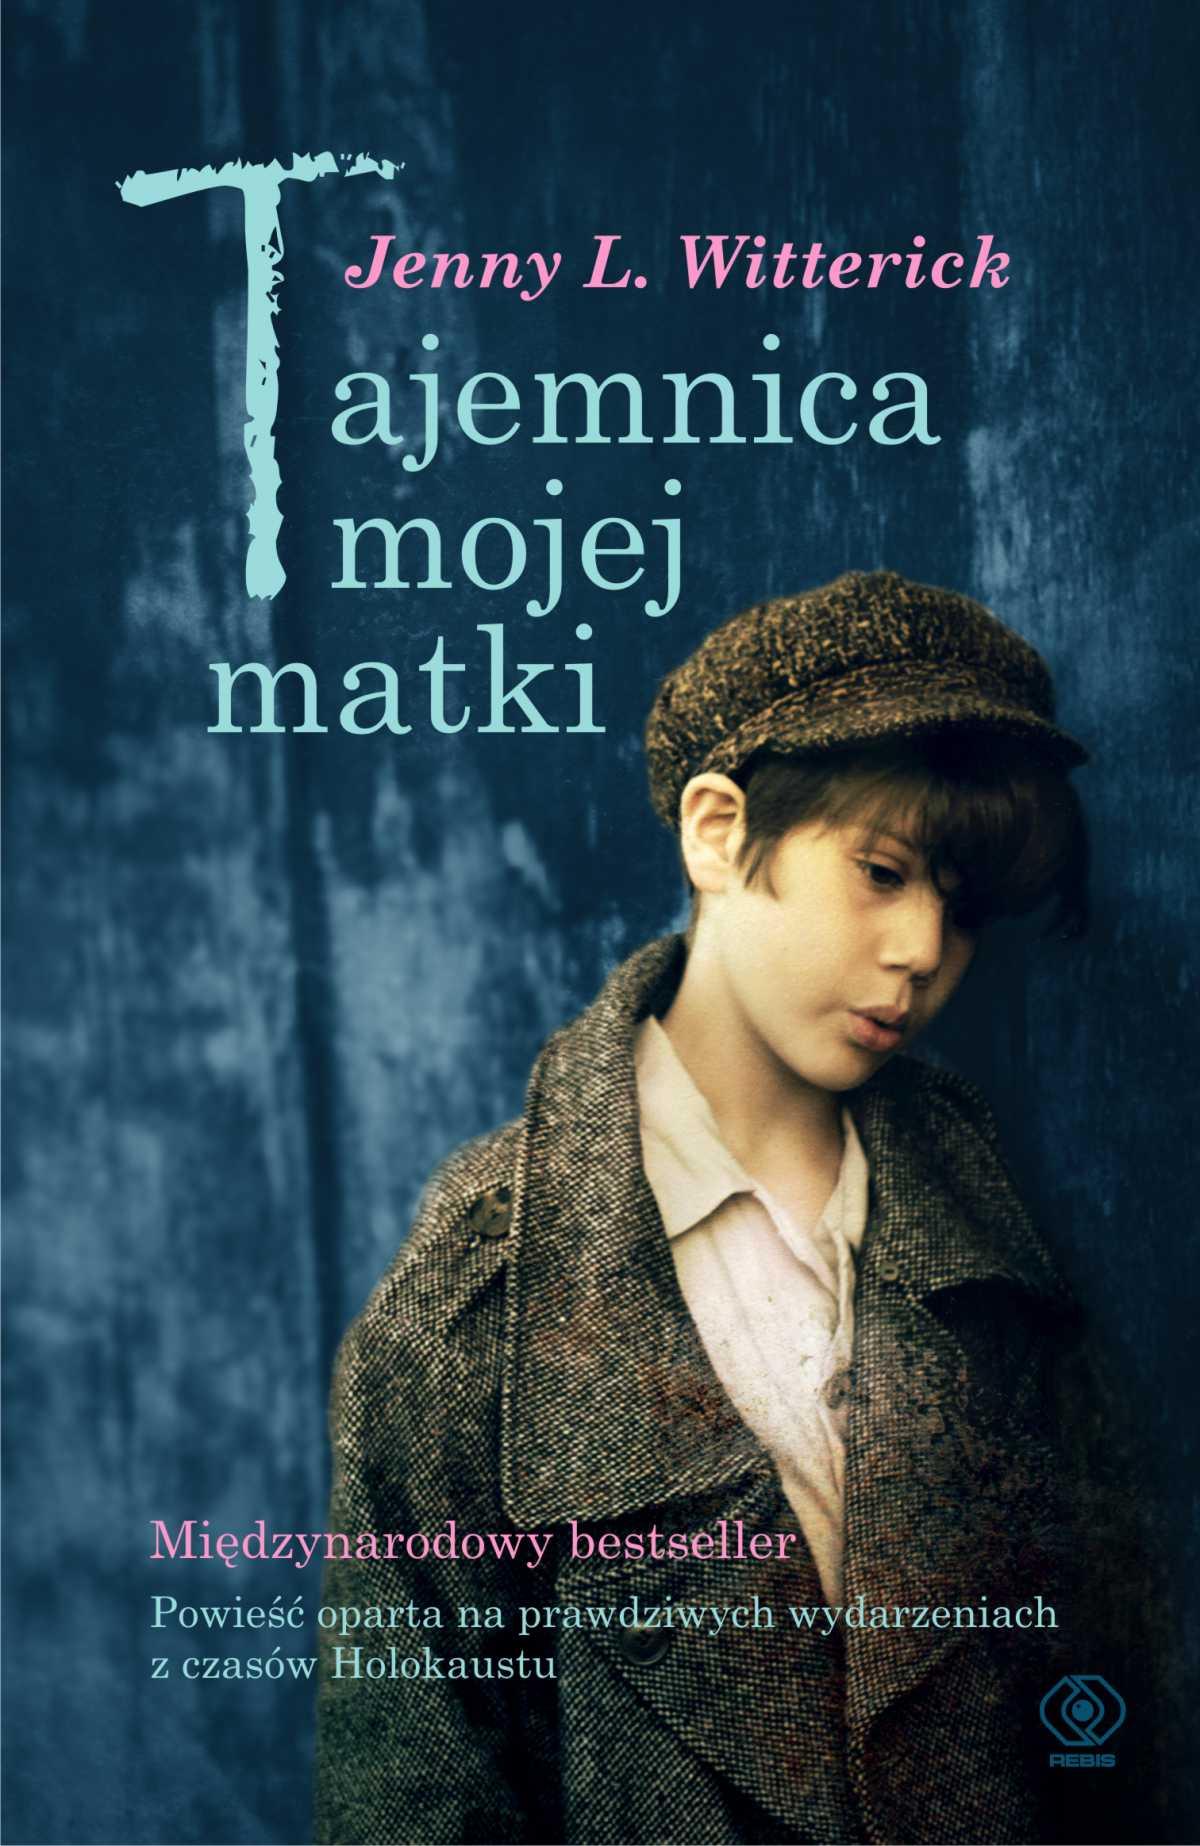 Tajemnica mojej matki - Ebook (Książka na Kindle) do pobrania w formacie MOBI